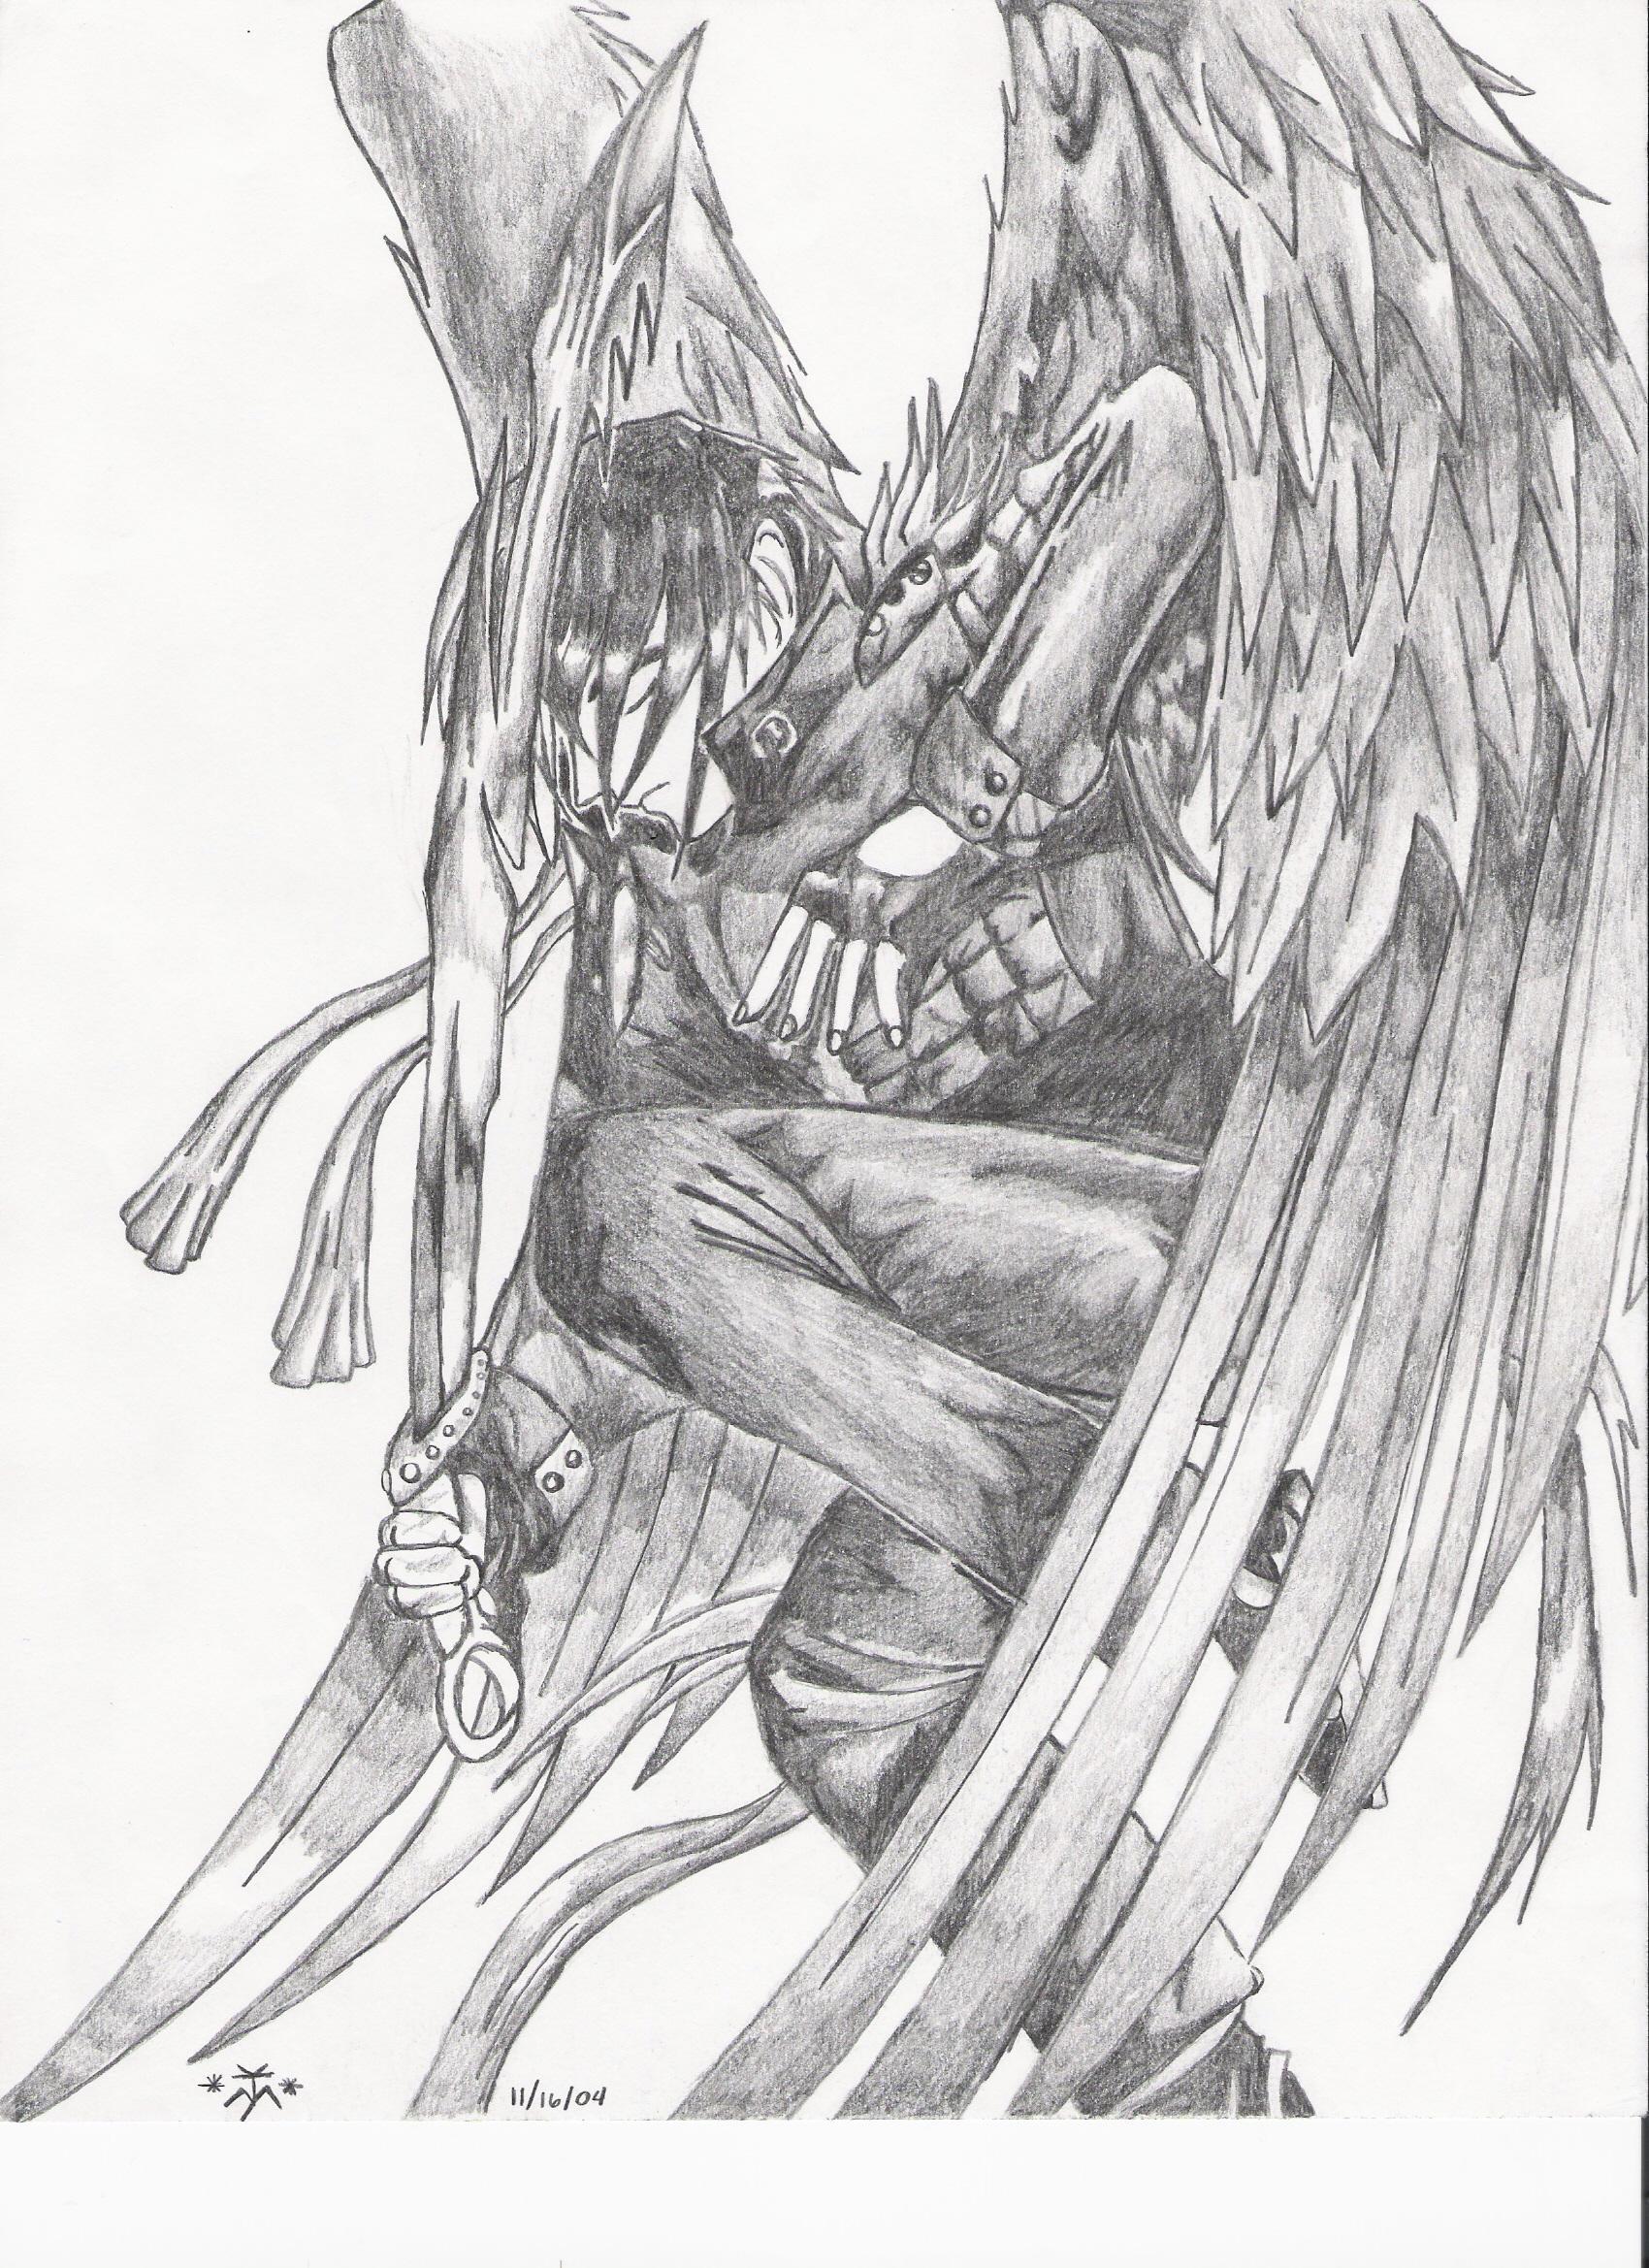 angel warrior by jay81 manga anime traditional media drawings 2004 ...